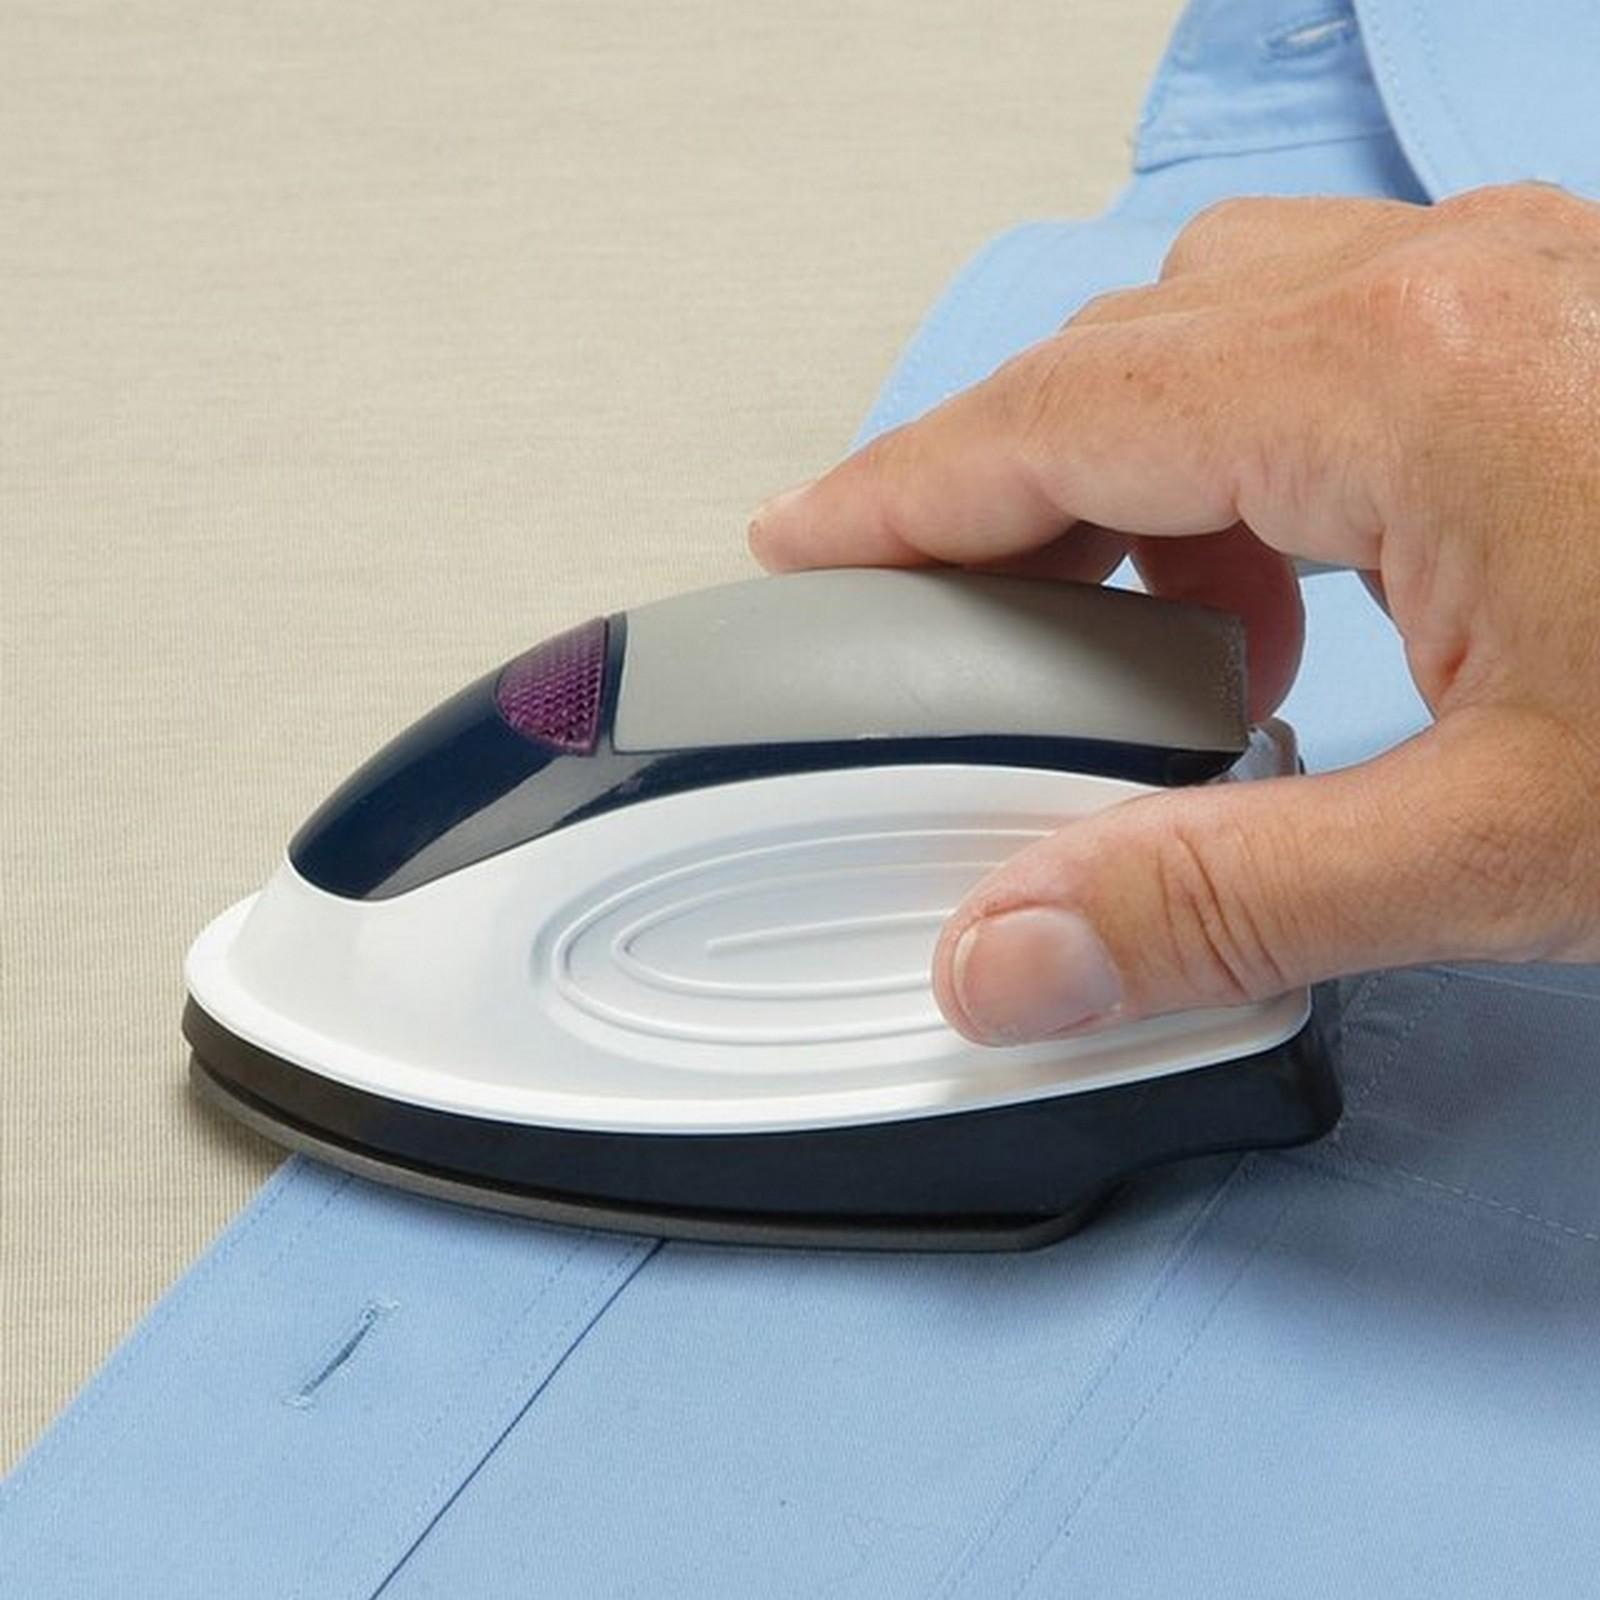 15 New Inventions - Electric portable mini iron.